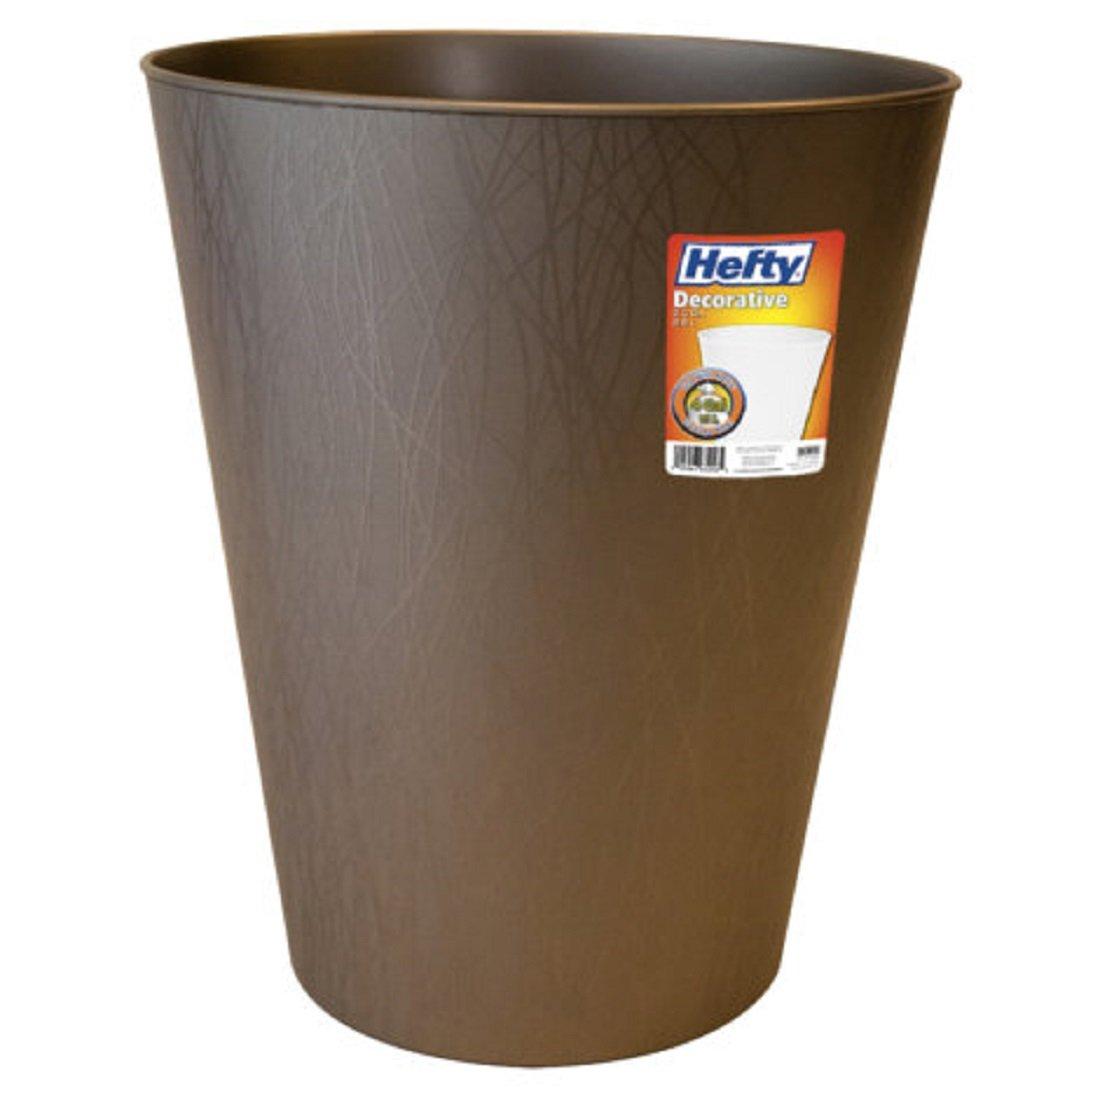 Hefty Decorative Textured Multi-Purpose Oval Wastebasket with Willow Pattern - durable plastic, lightweight - 2.3 Gallon (Bronze)